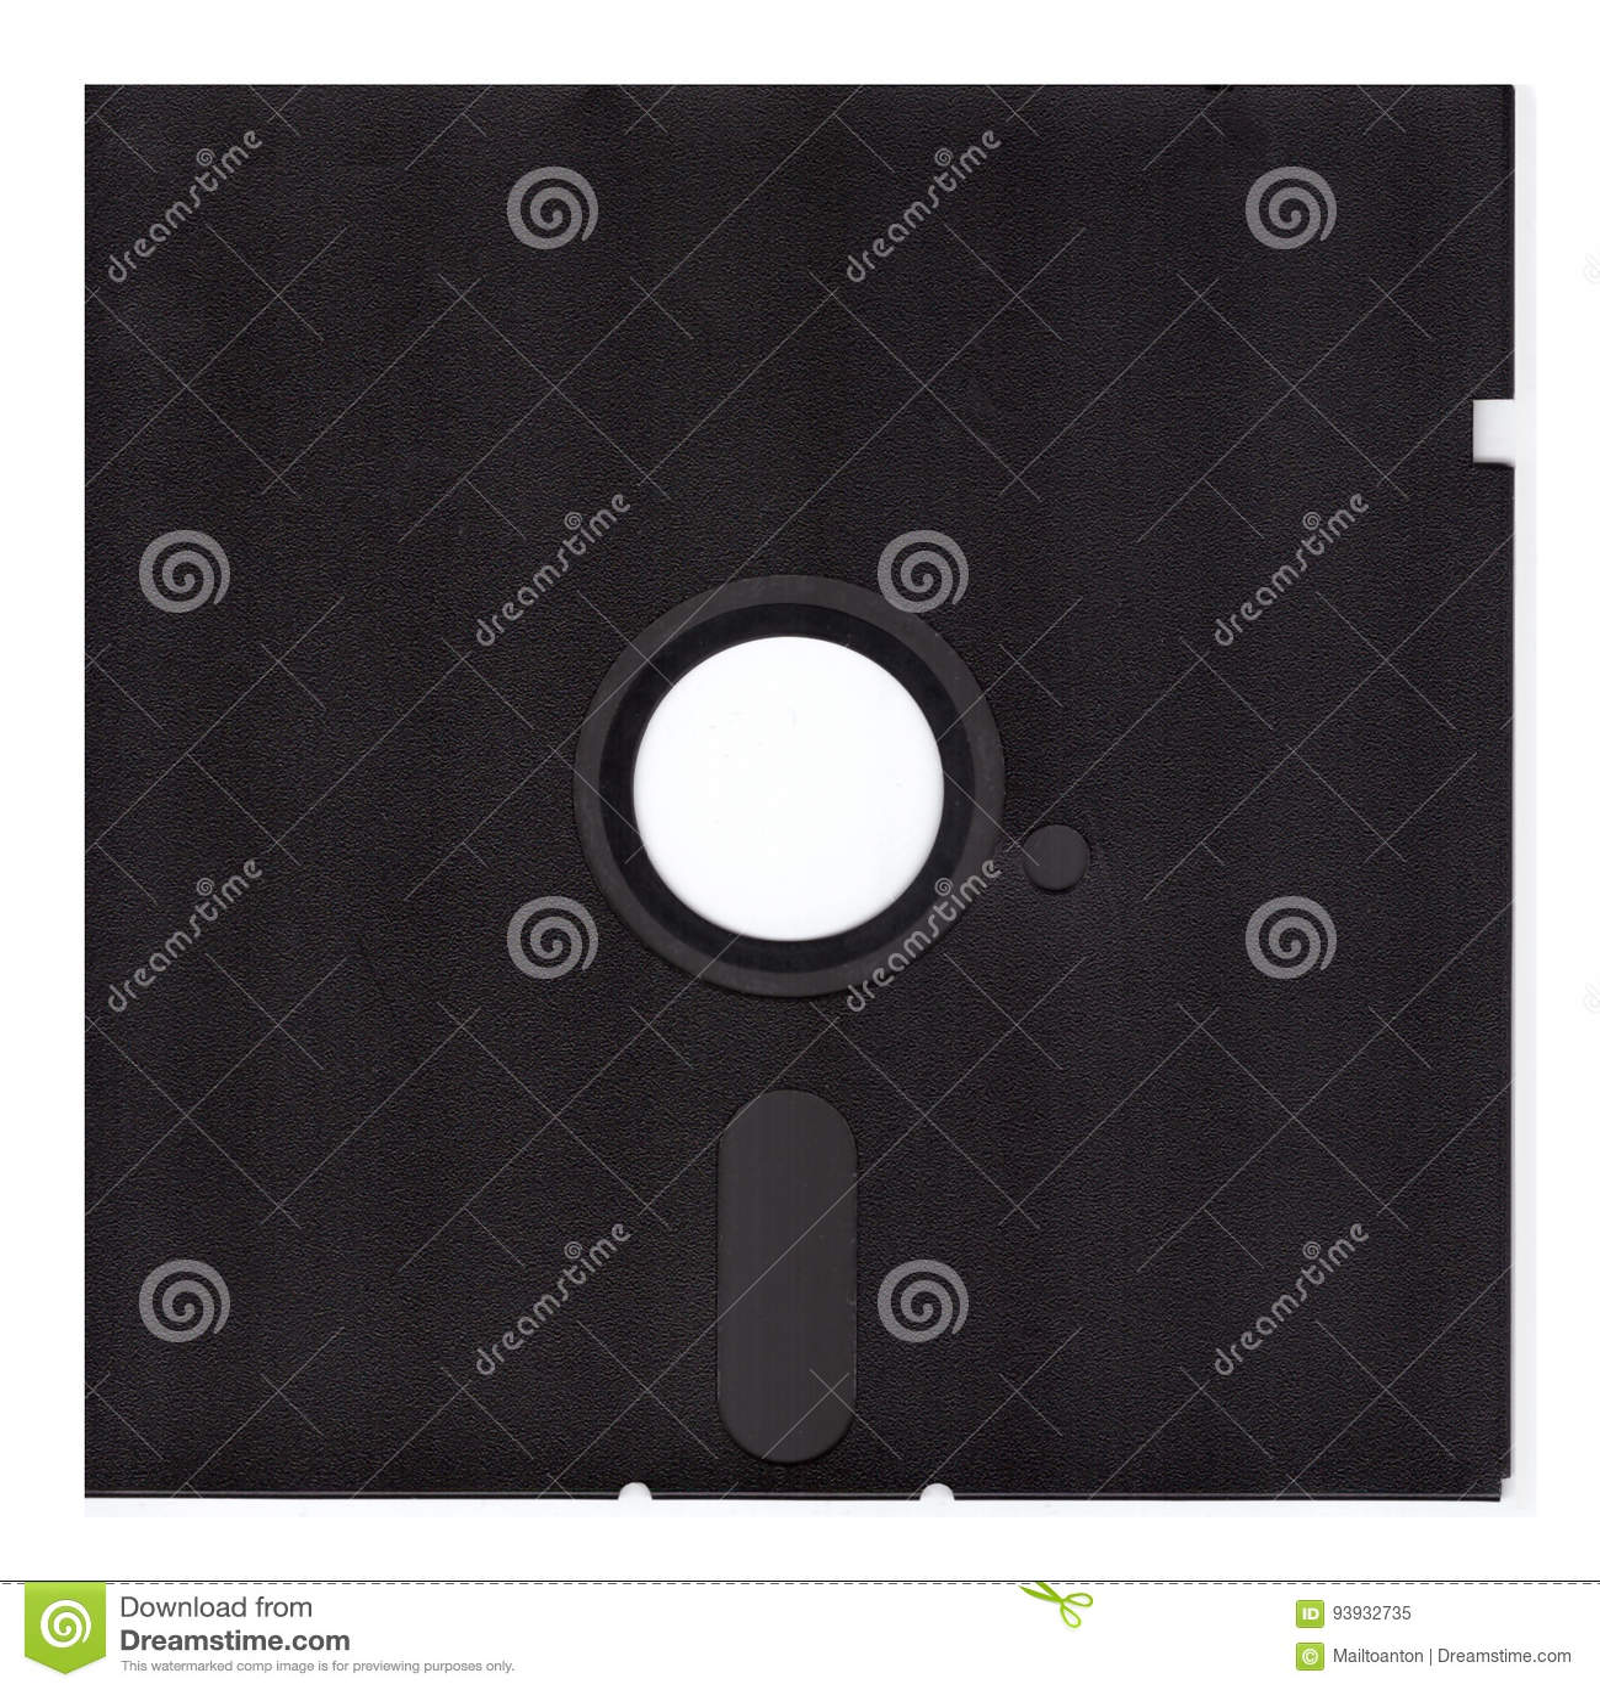 Diskette 5.25inch